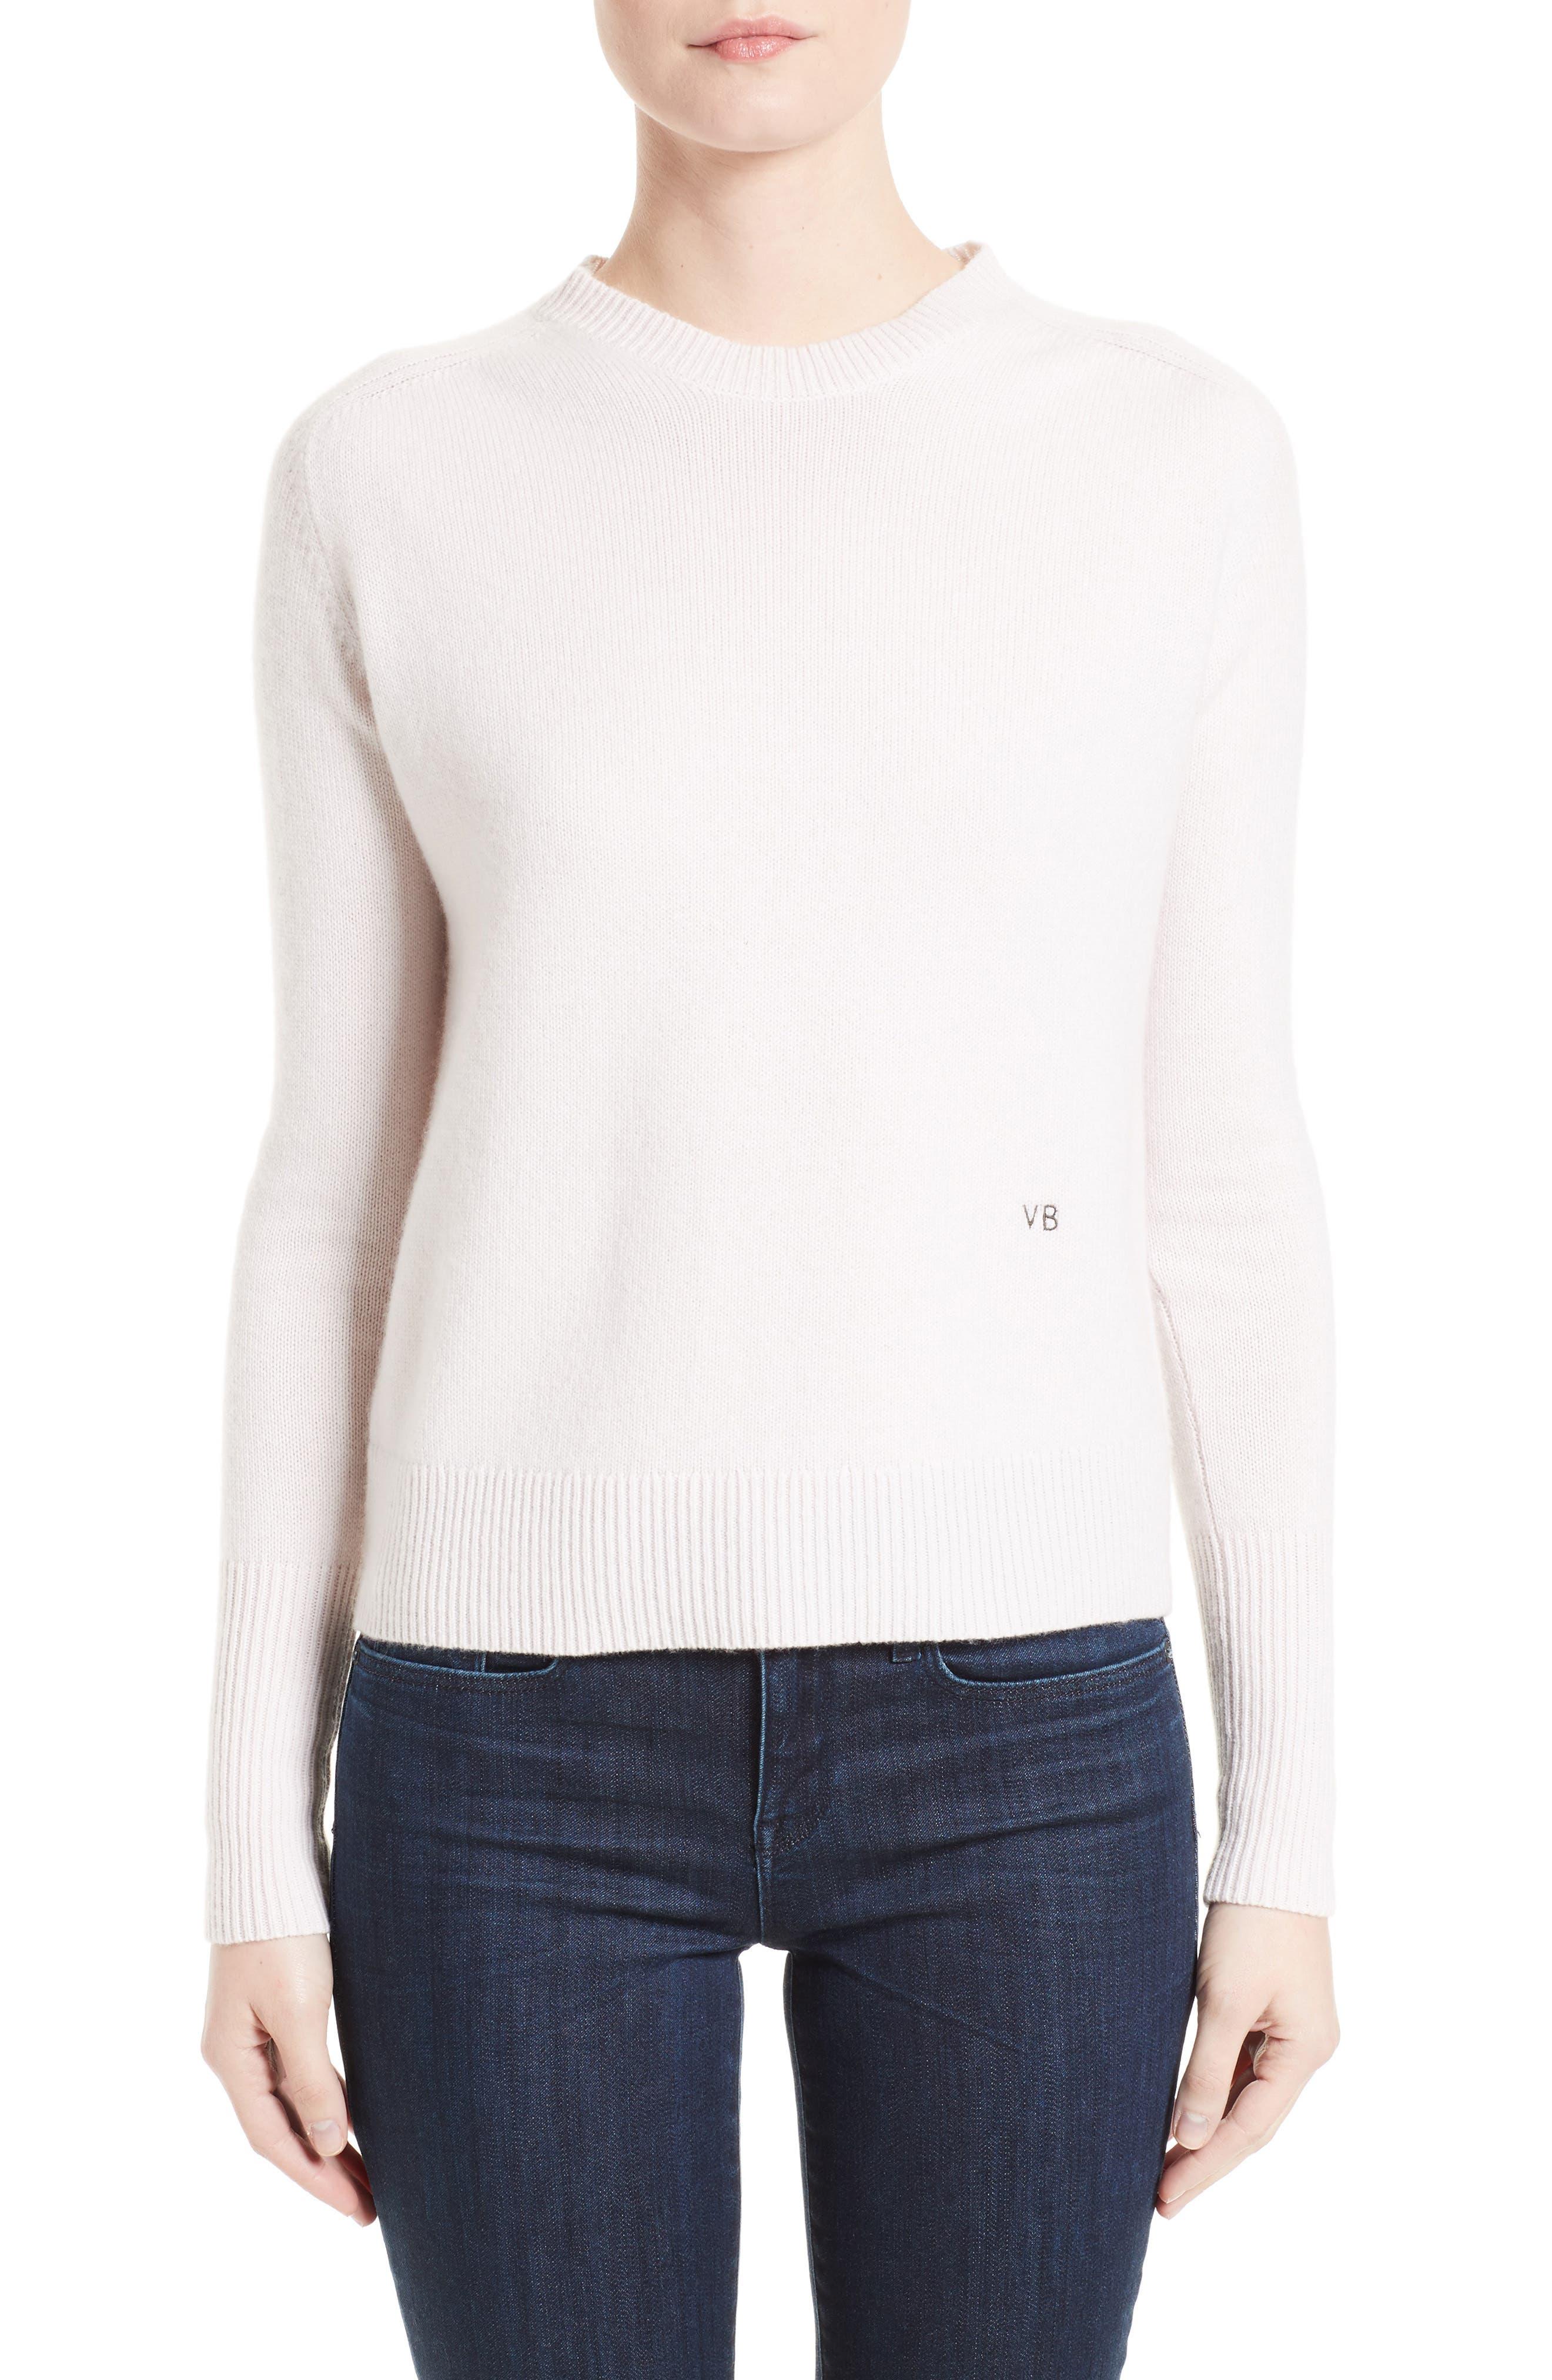 Main Image - Victoria Beckham Cashmere Sweater